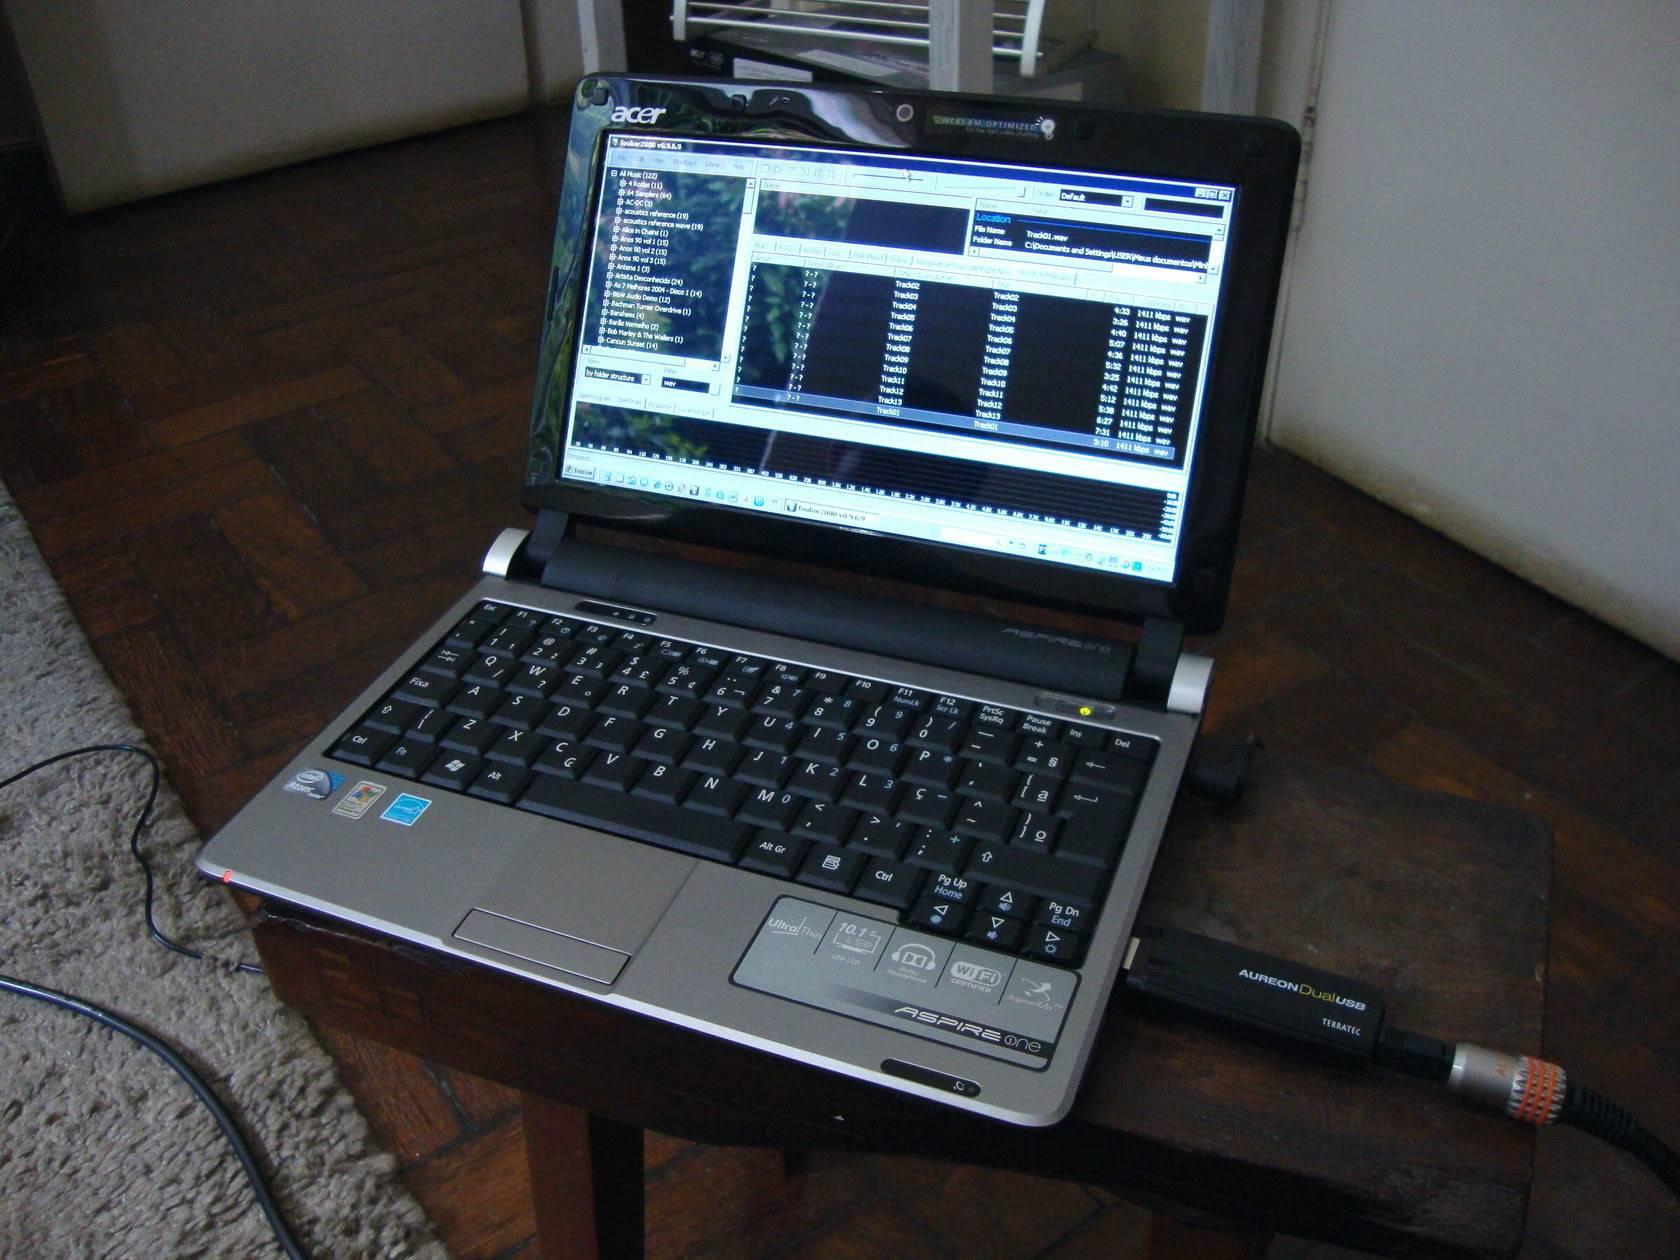 Sistema 2ch estéreo (mutante) do LUKE - Página 6 Picture083_resize_resize